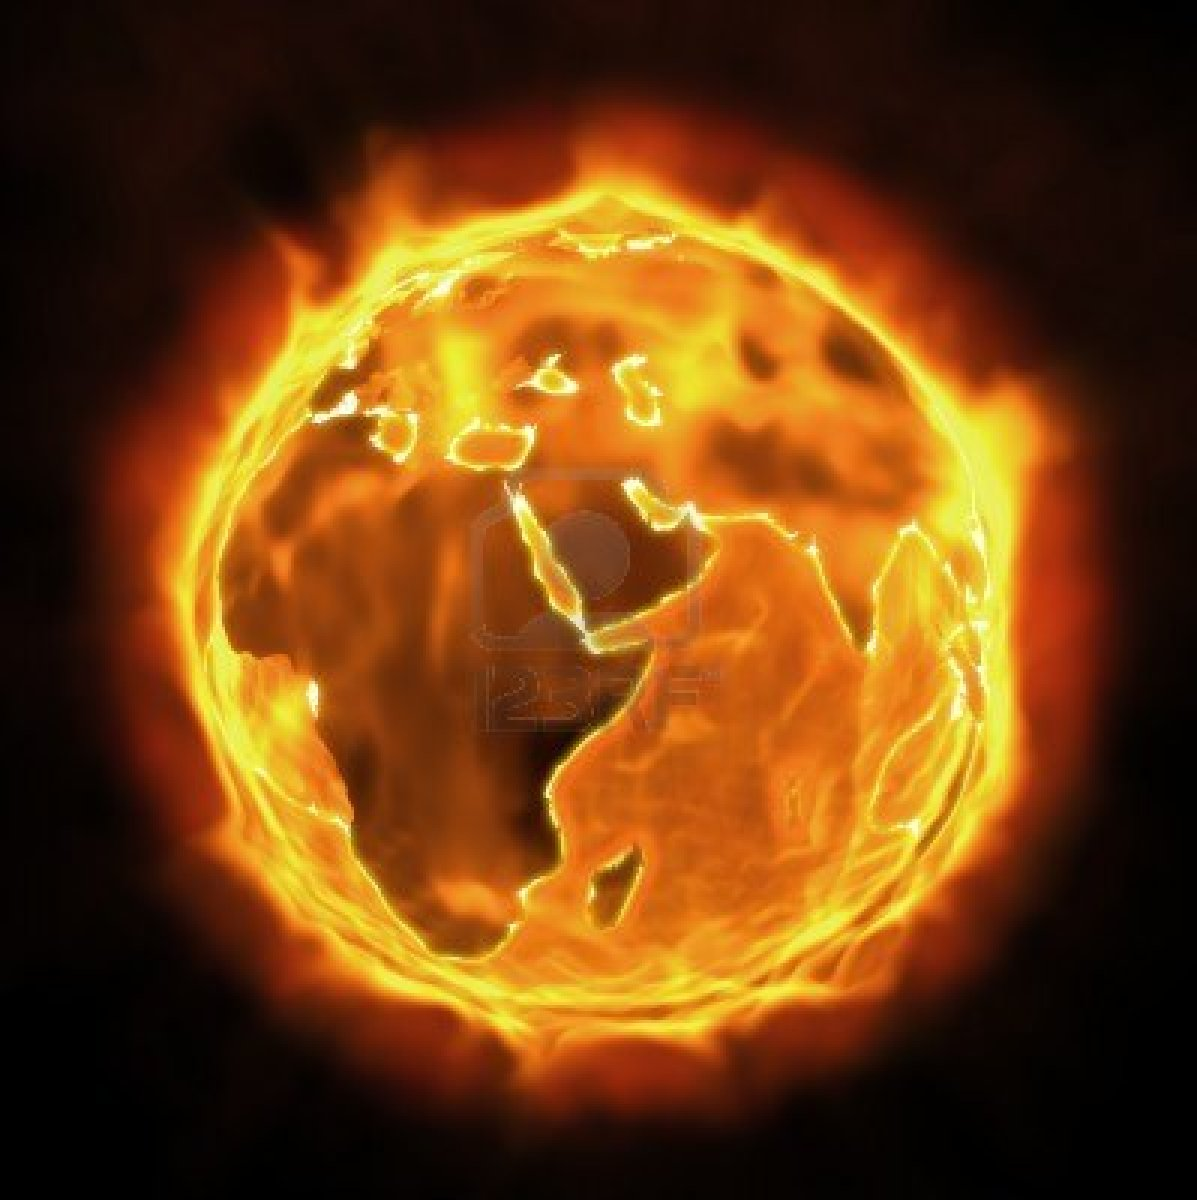 Burning Ice Planet Gliese 436 B Machprinciple